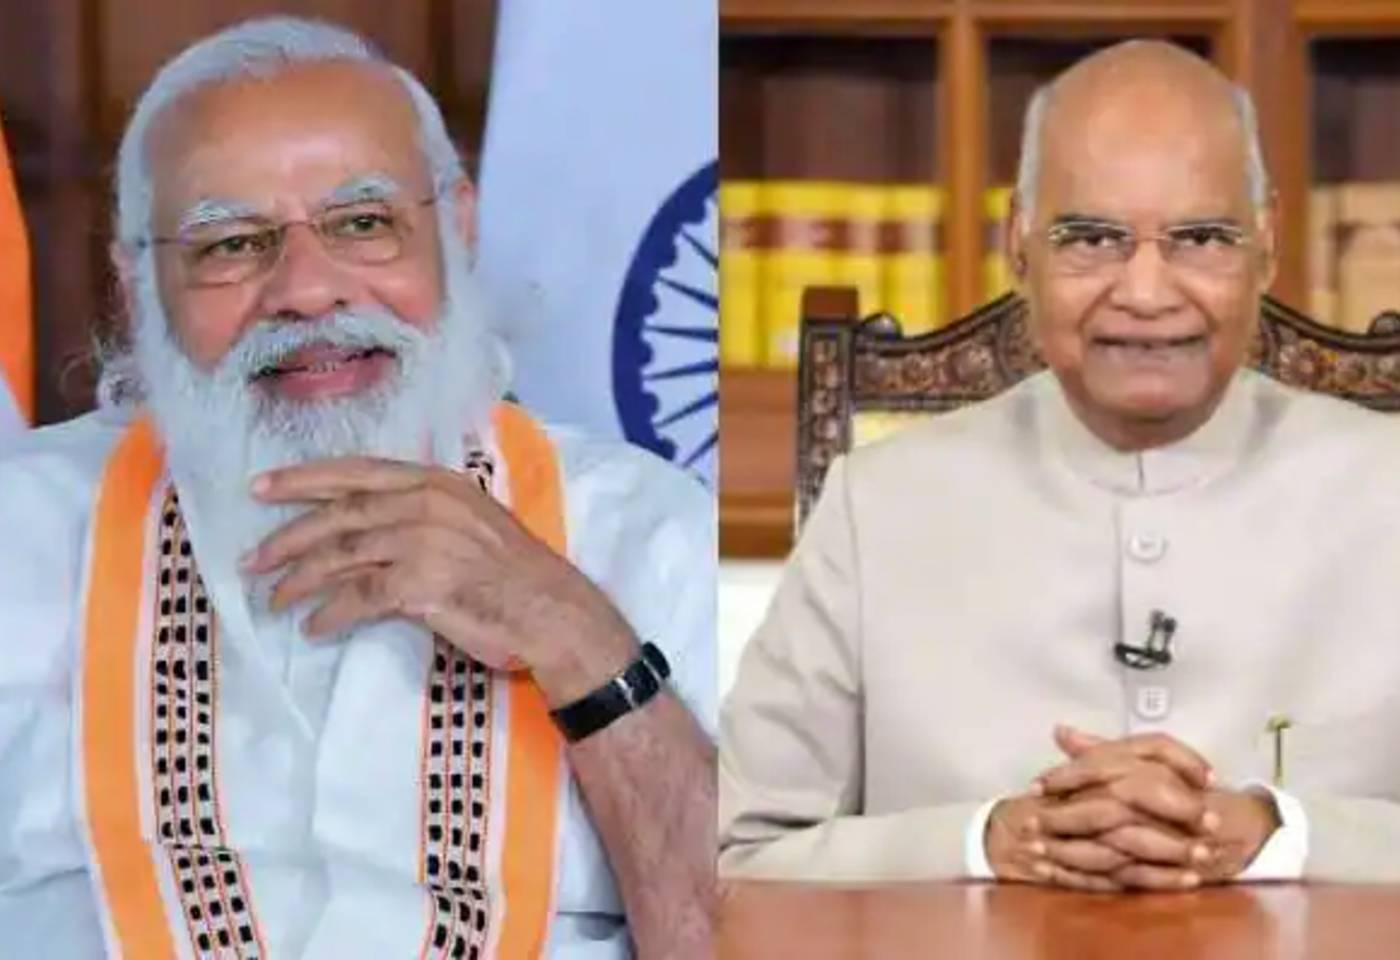 eid-ul-adha president and prime minister Modi congratulates eid al adha wished for harmony and love